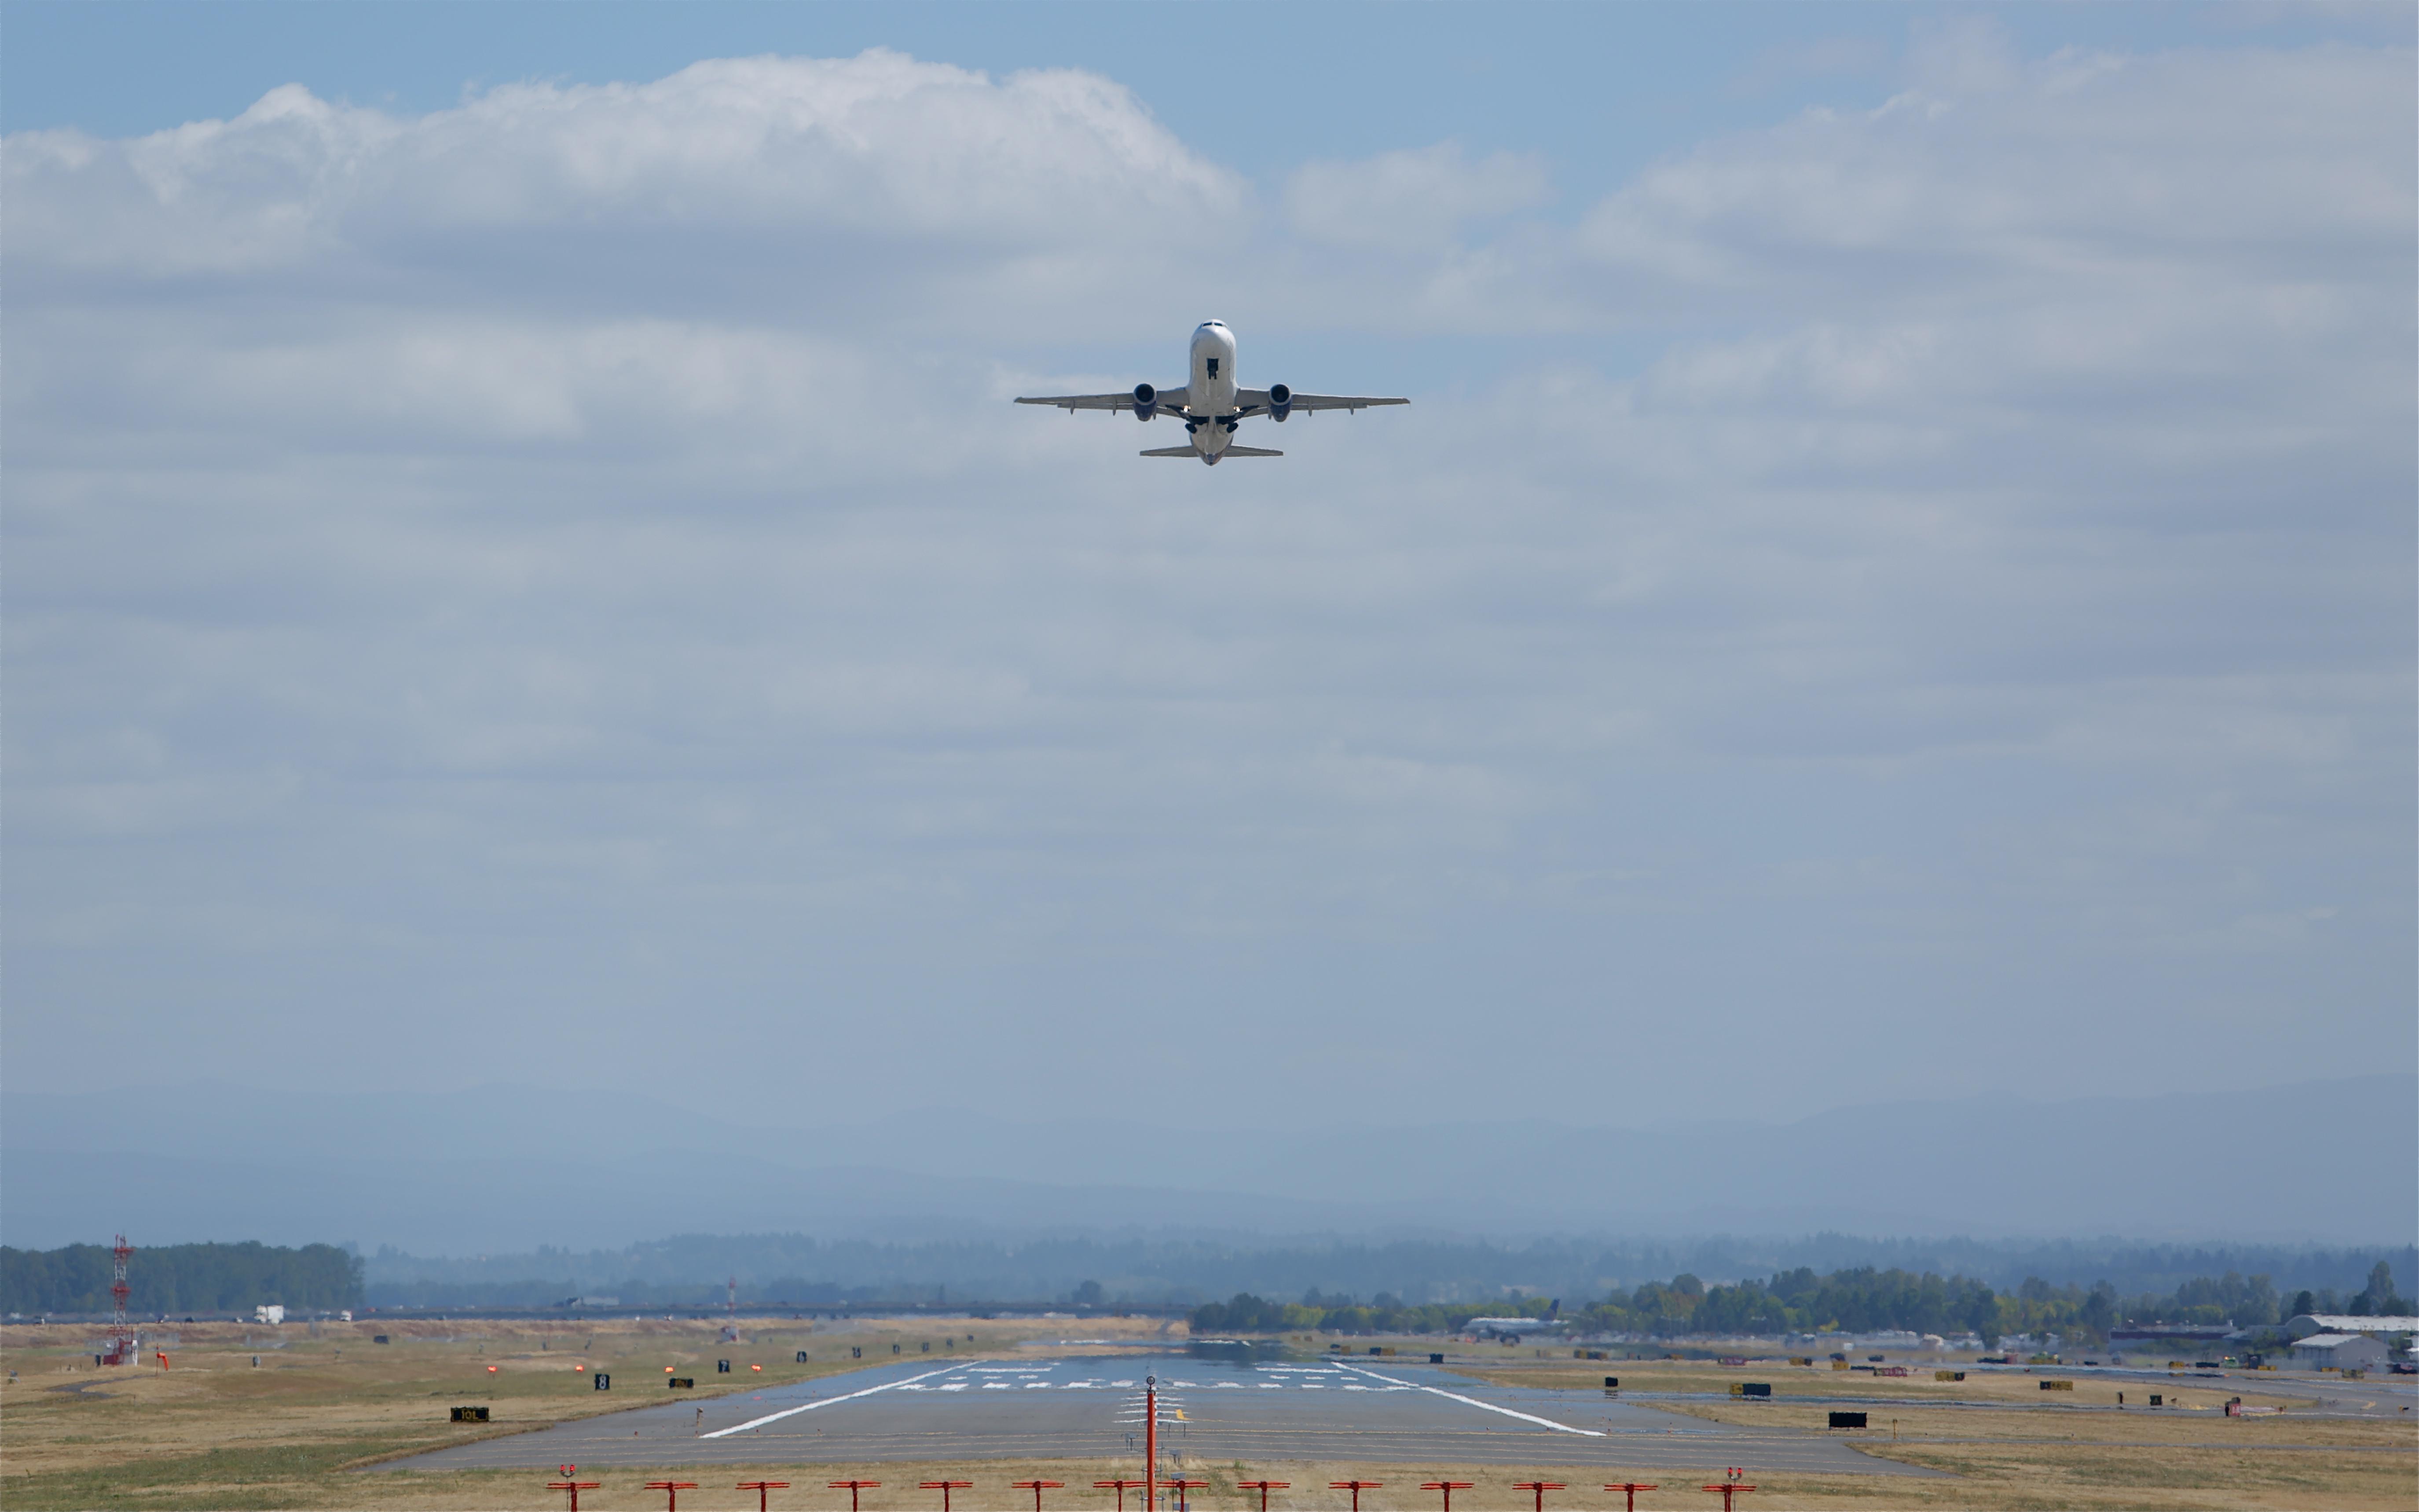 The US Federal Aviation Administration (FAA) uses the ILAC MRA